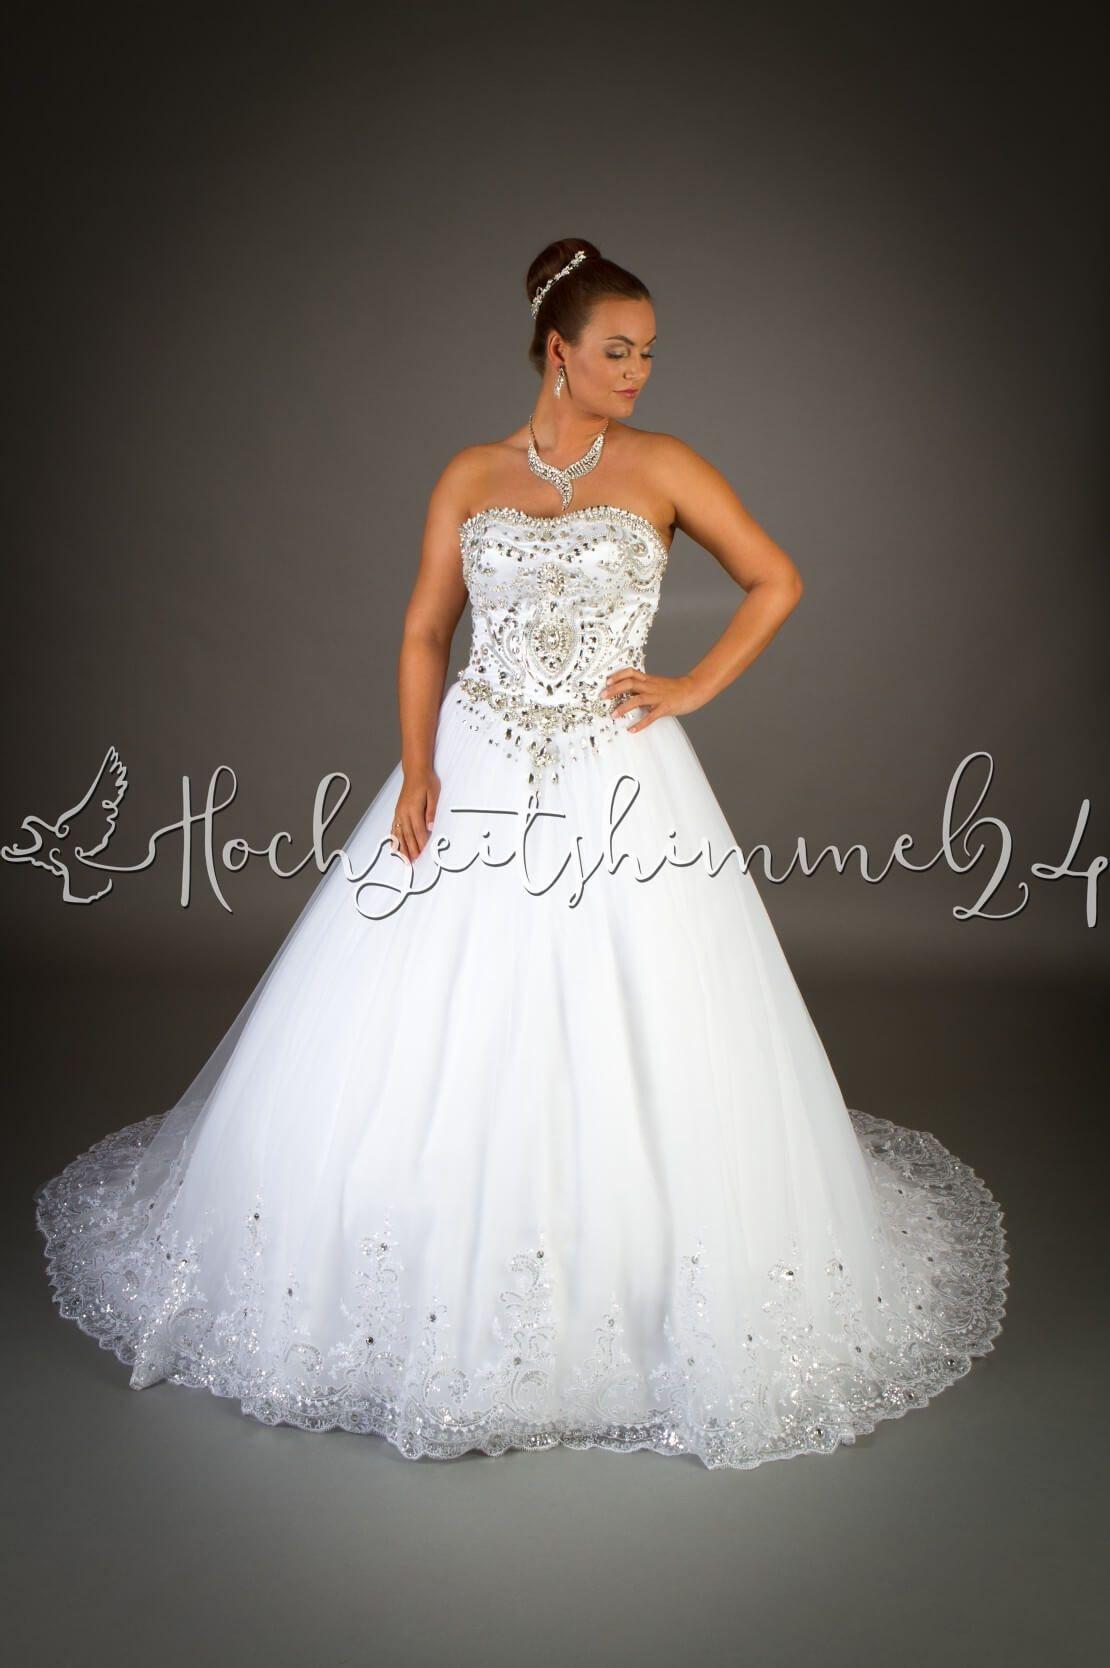 Hochzeitskleid Glitzer #glitzer #hochzeitskleid  Brautkleid